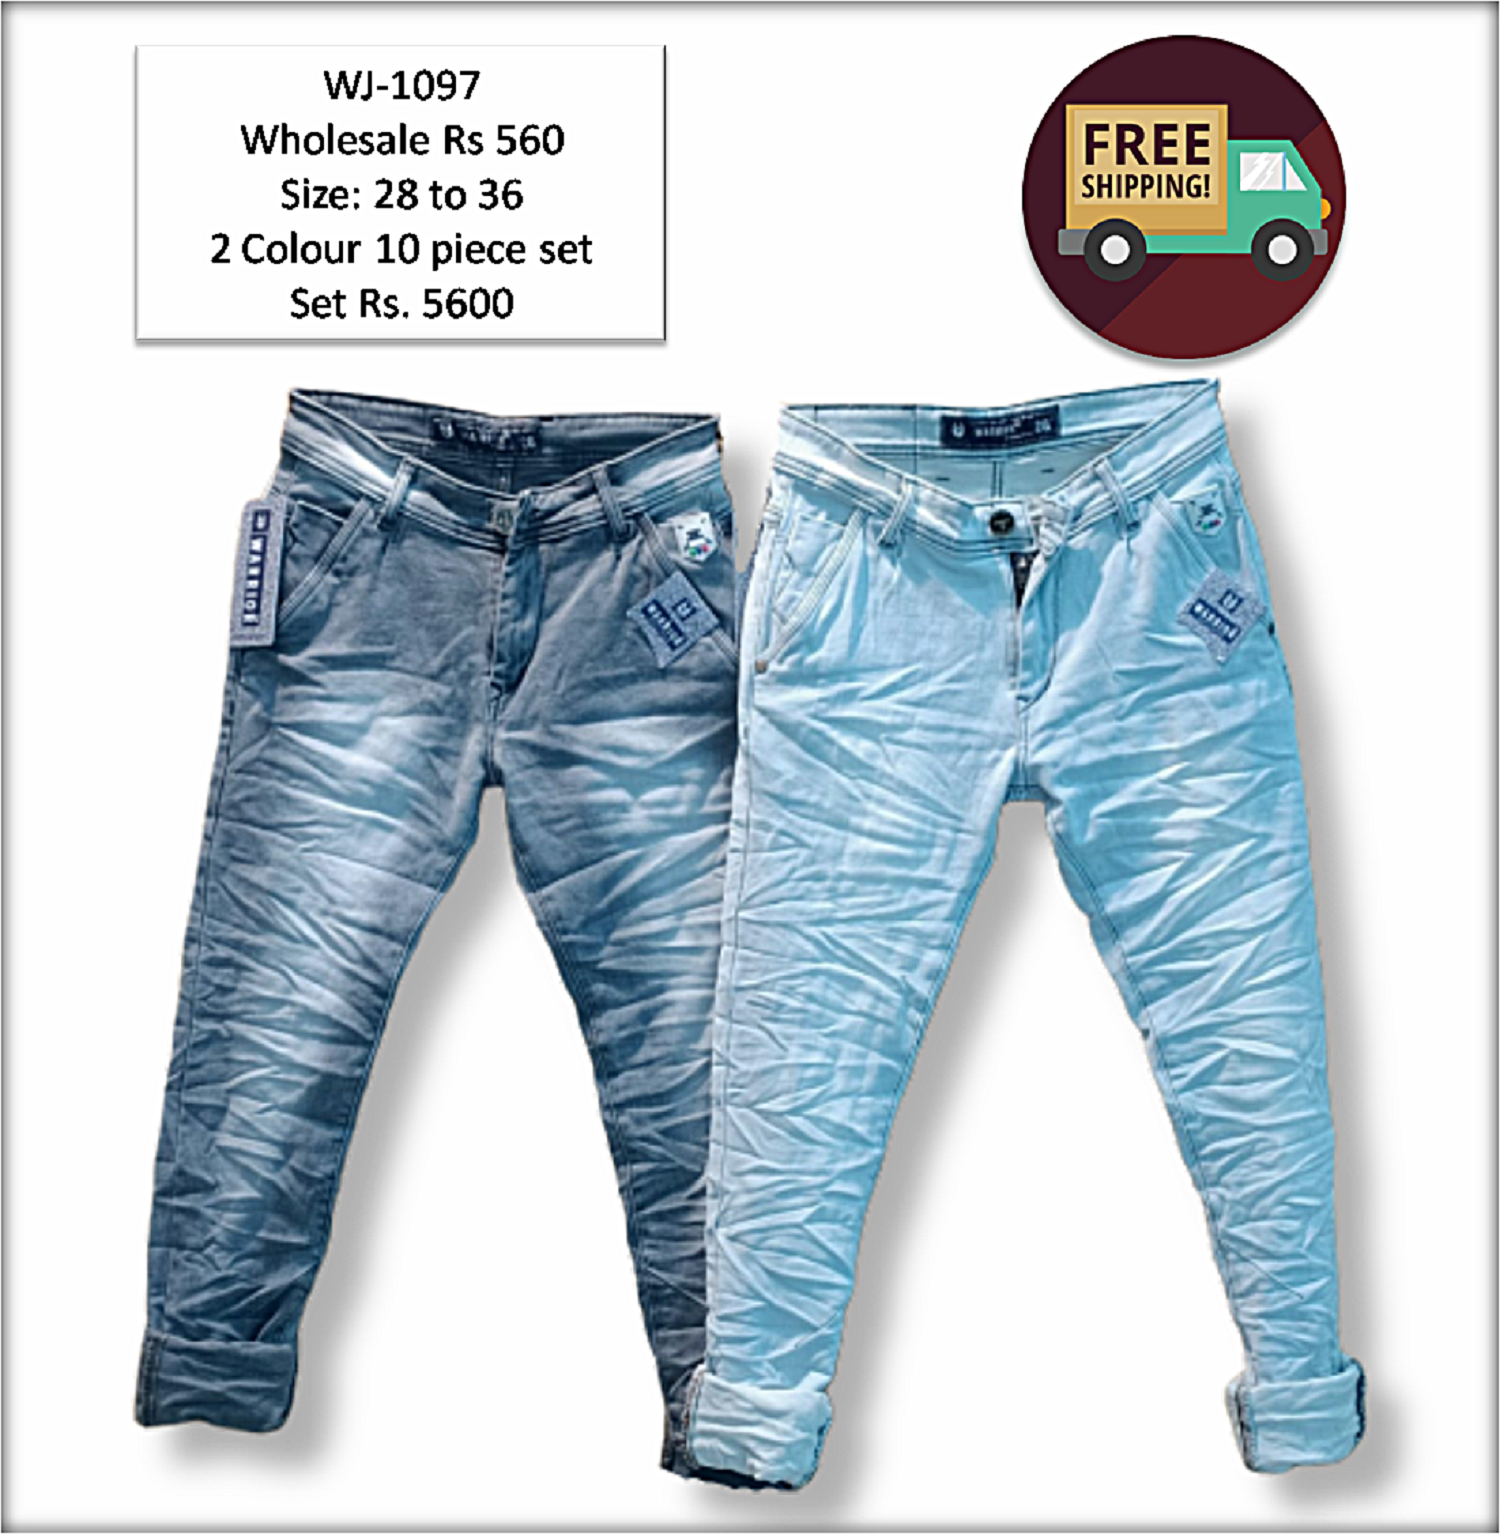 Men Wrinkle Jeans 2 Colours Set Wholesale B2b In